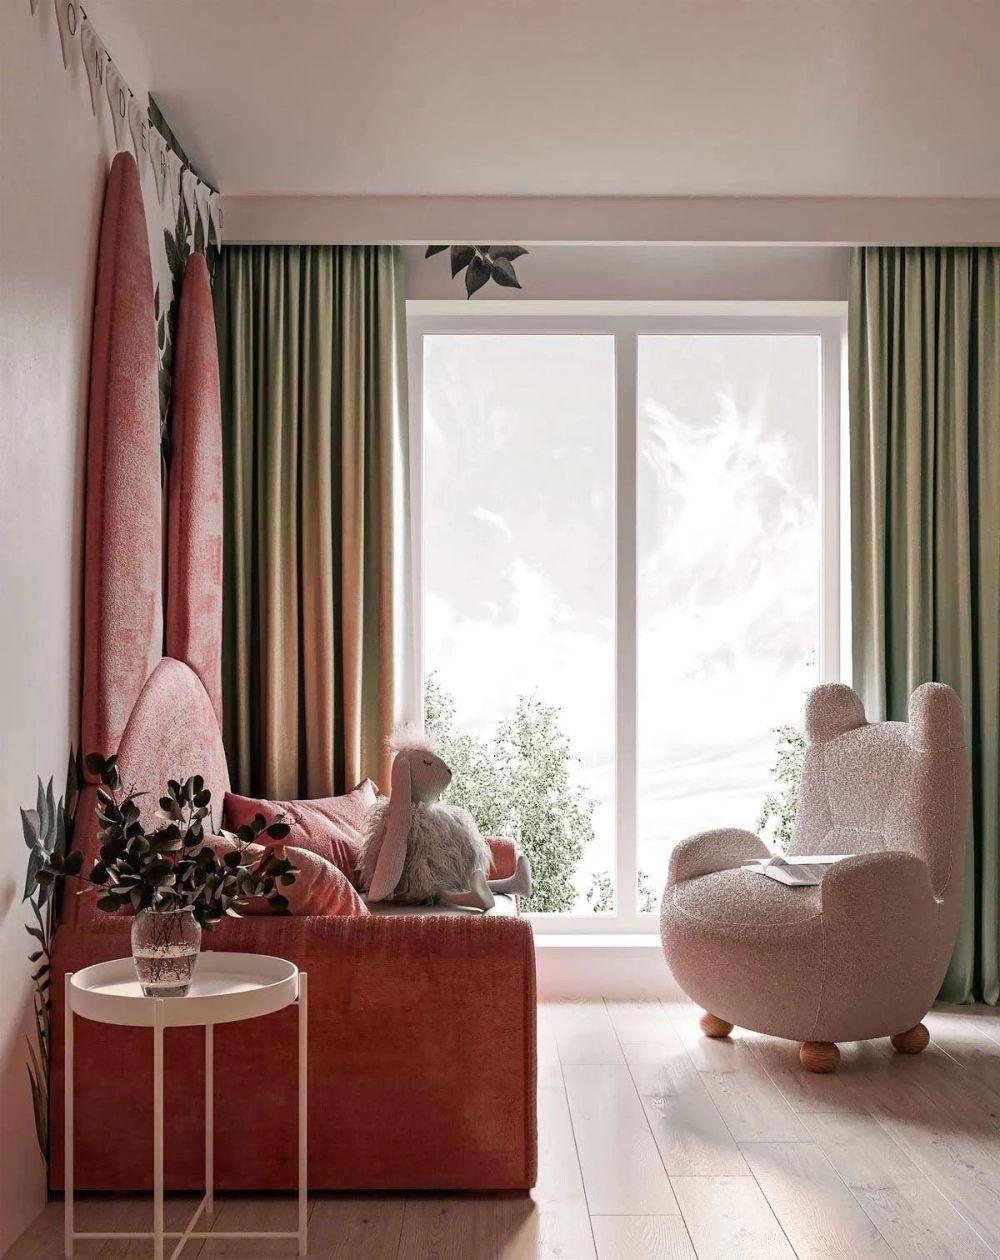 【ZROBYM architects】白俄罗斯明斯克州 高颜值、高质感住宅  _白俄罗斯明斯克州高颜值、高质感住宅15.jpg